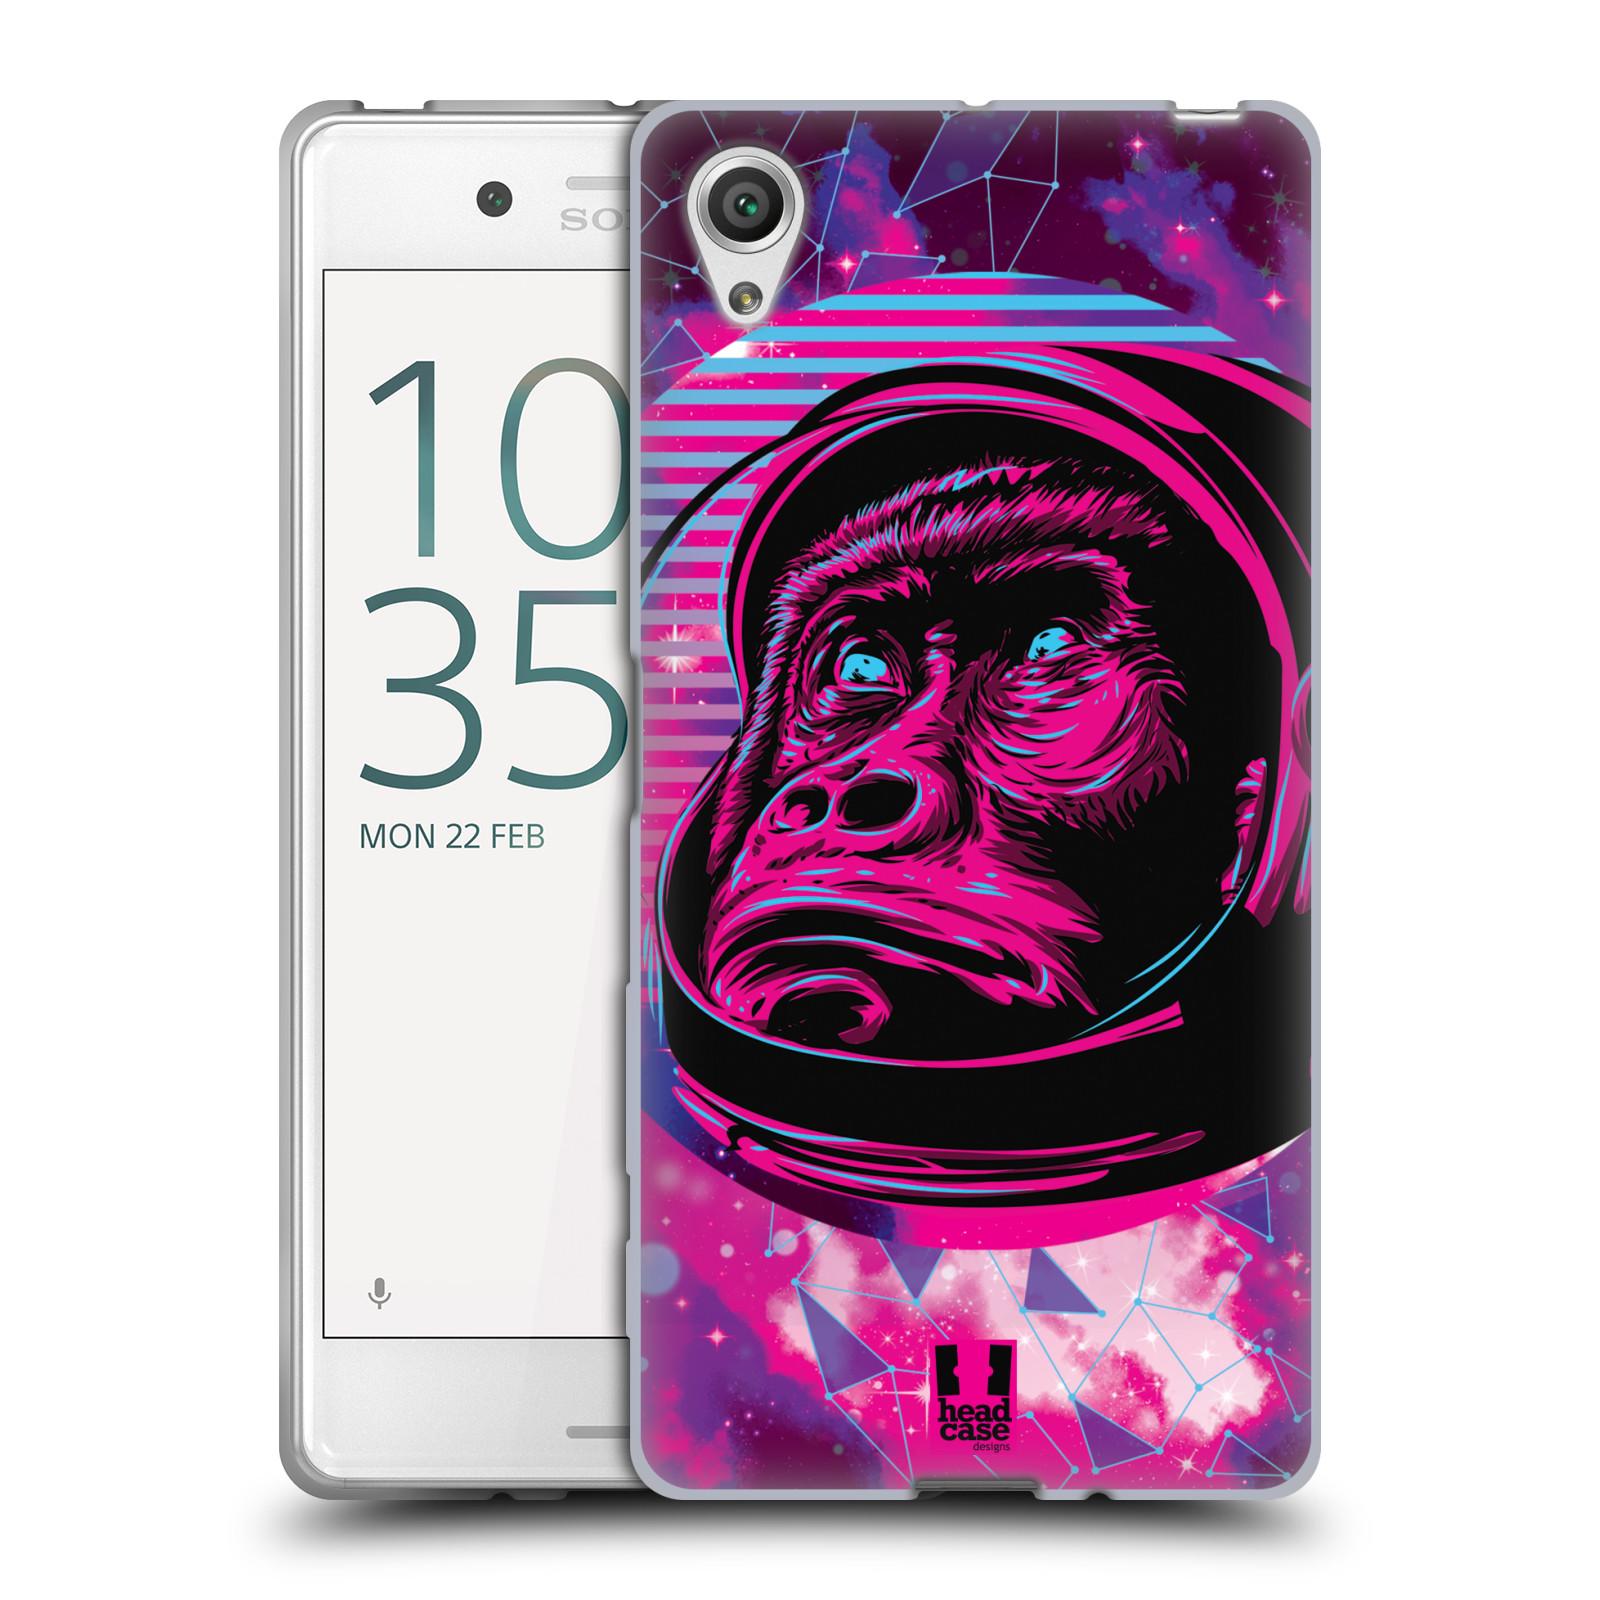 Silikonové pouzdro na mobil Sony Xperia X Head Case - Gorila ve skafandru